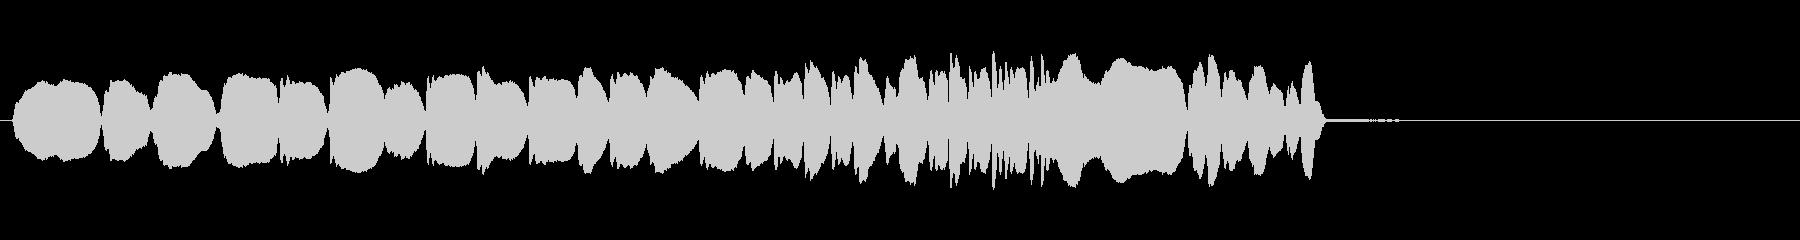 TROMBONE:TWO TONE...の未再生の波形